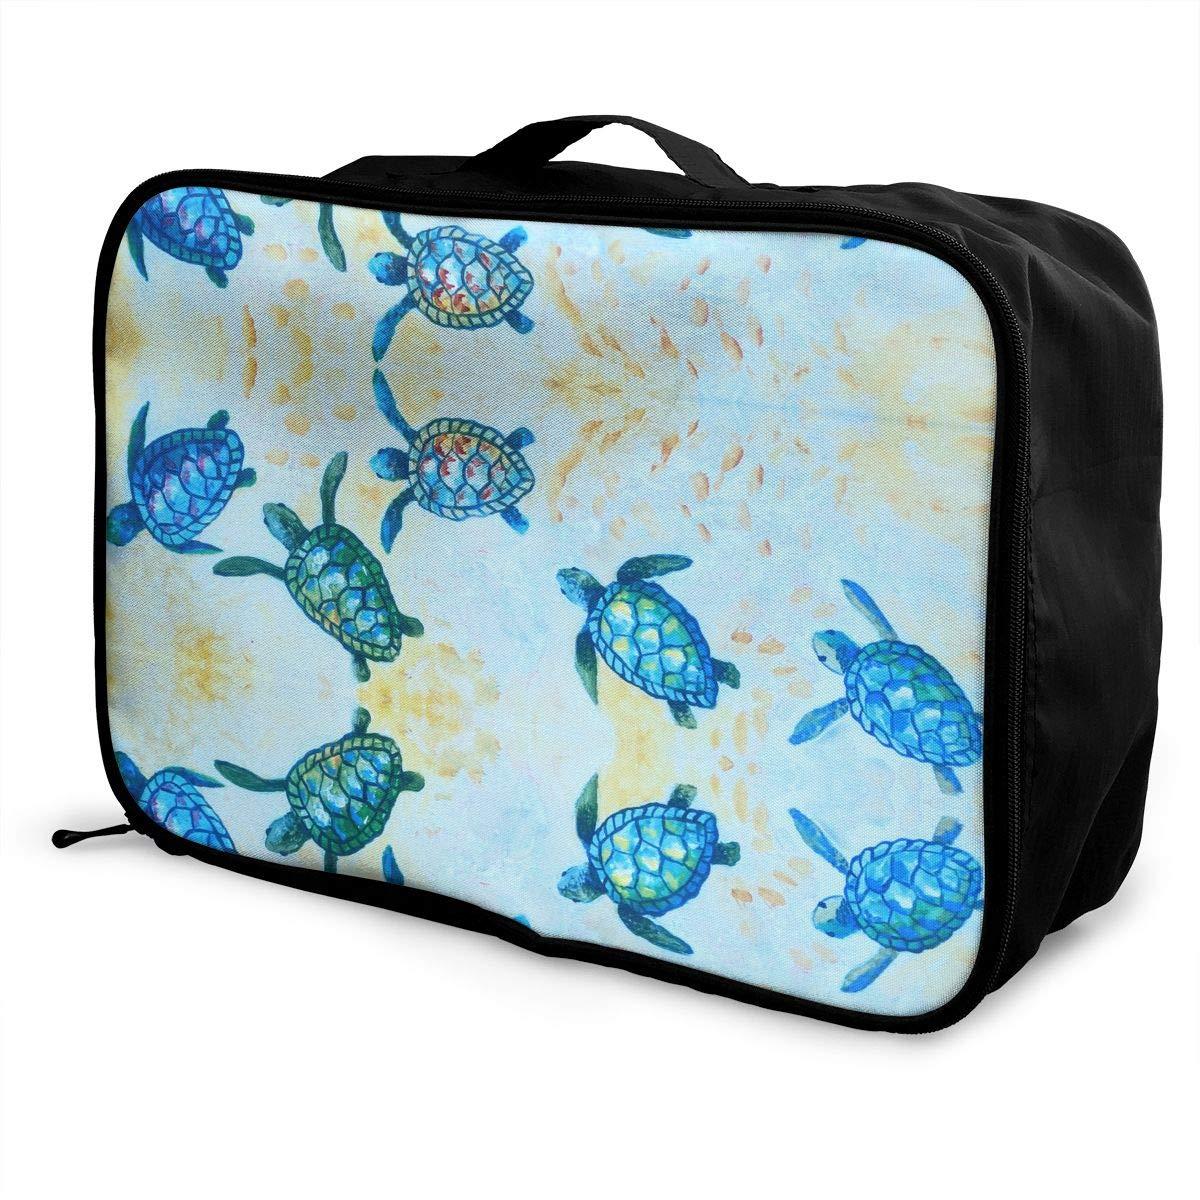 Travel Duffel Bag Waterproof Fashion Lightweight Large Capacity Portable Luggage Bag Blue Baby Sea Turtle